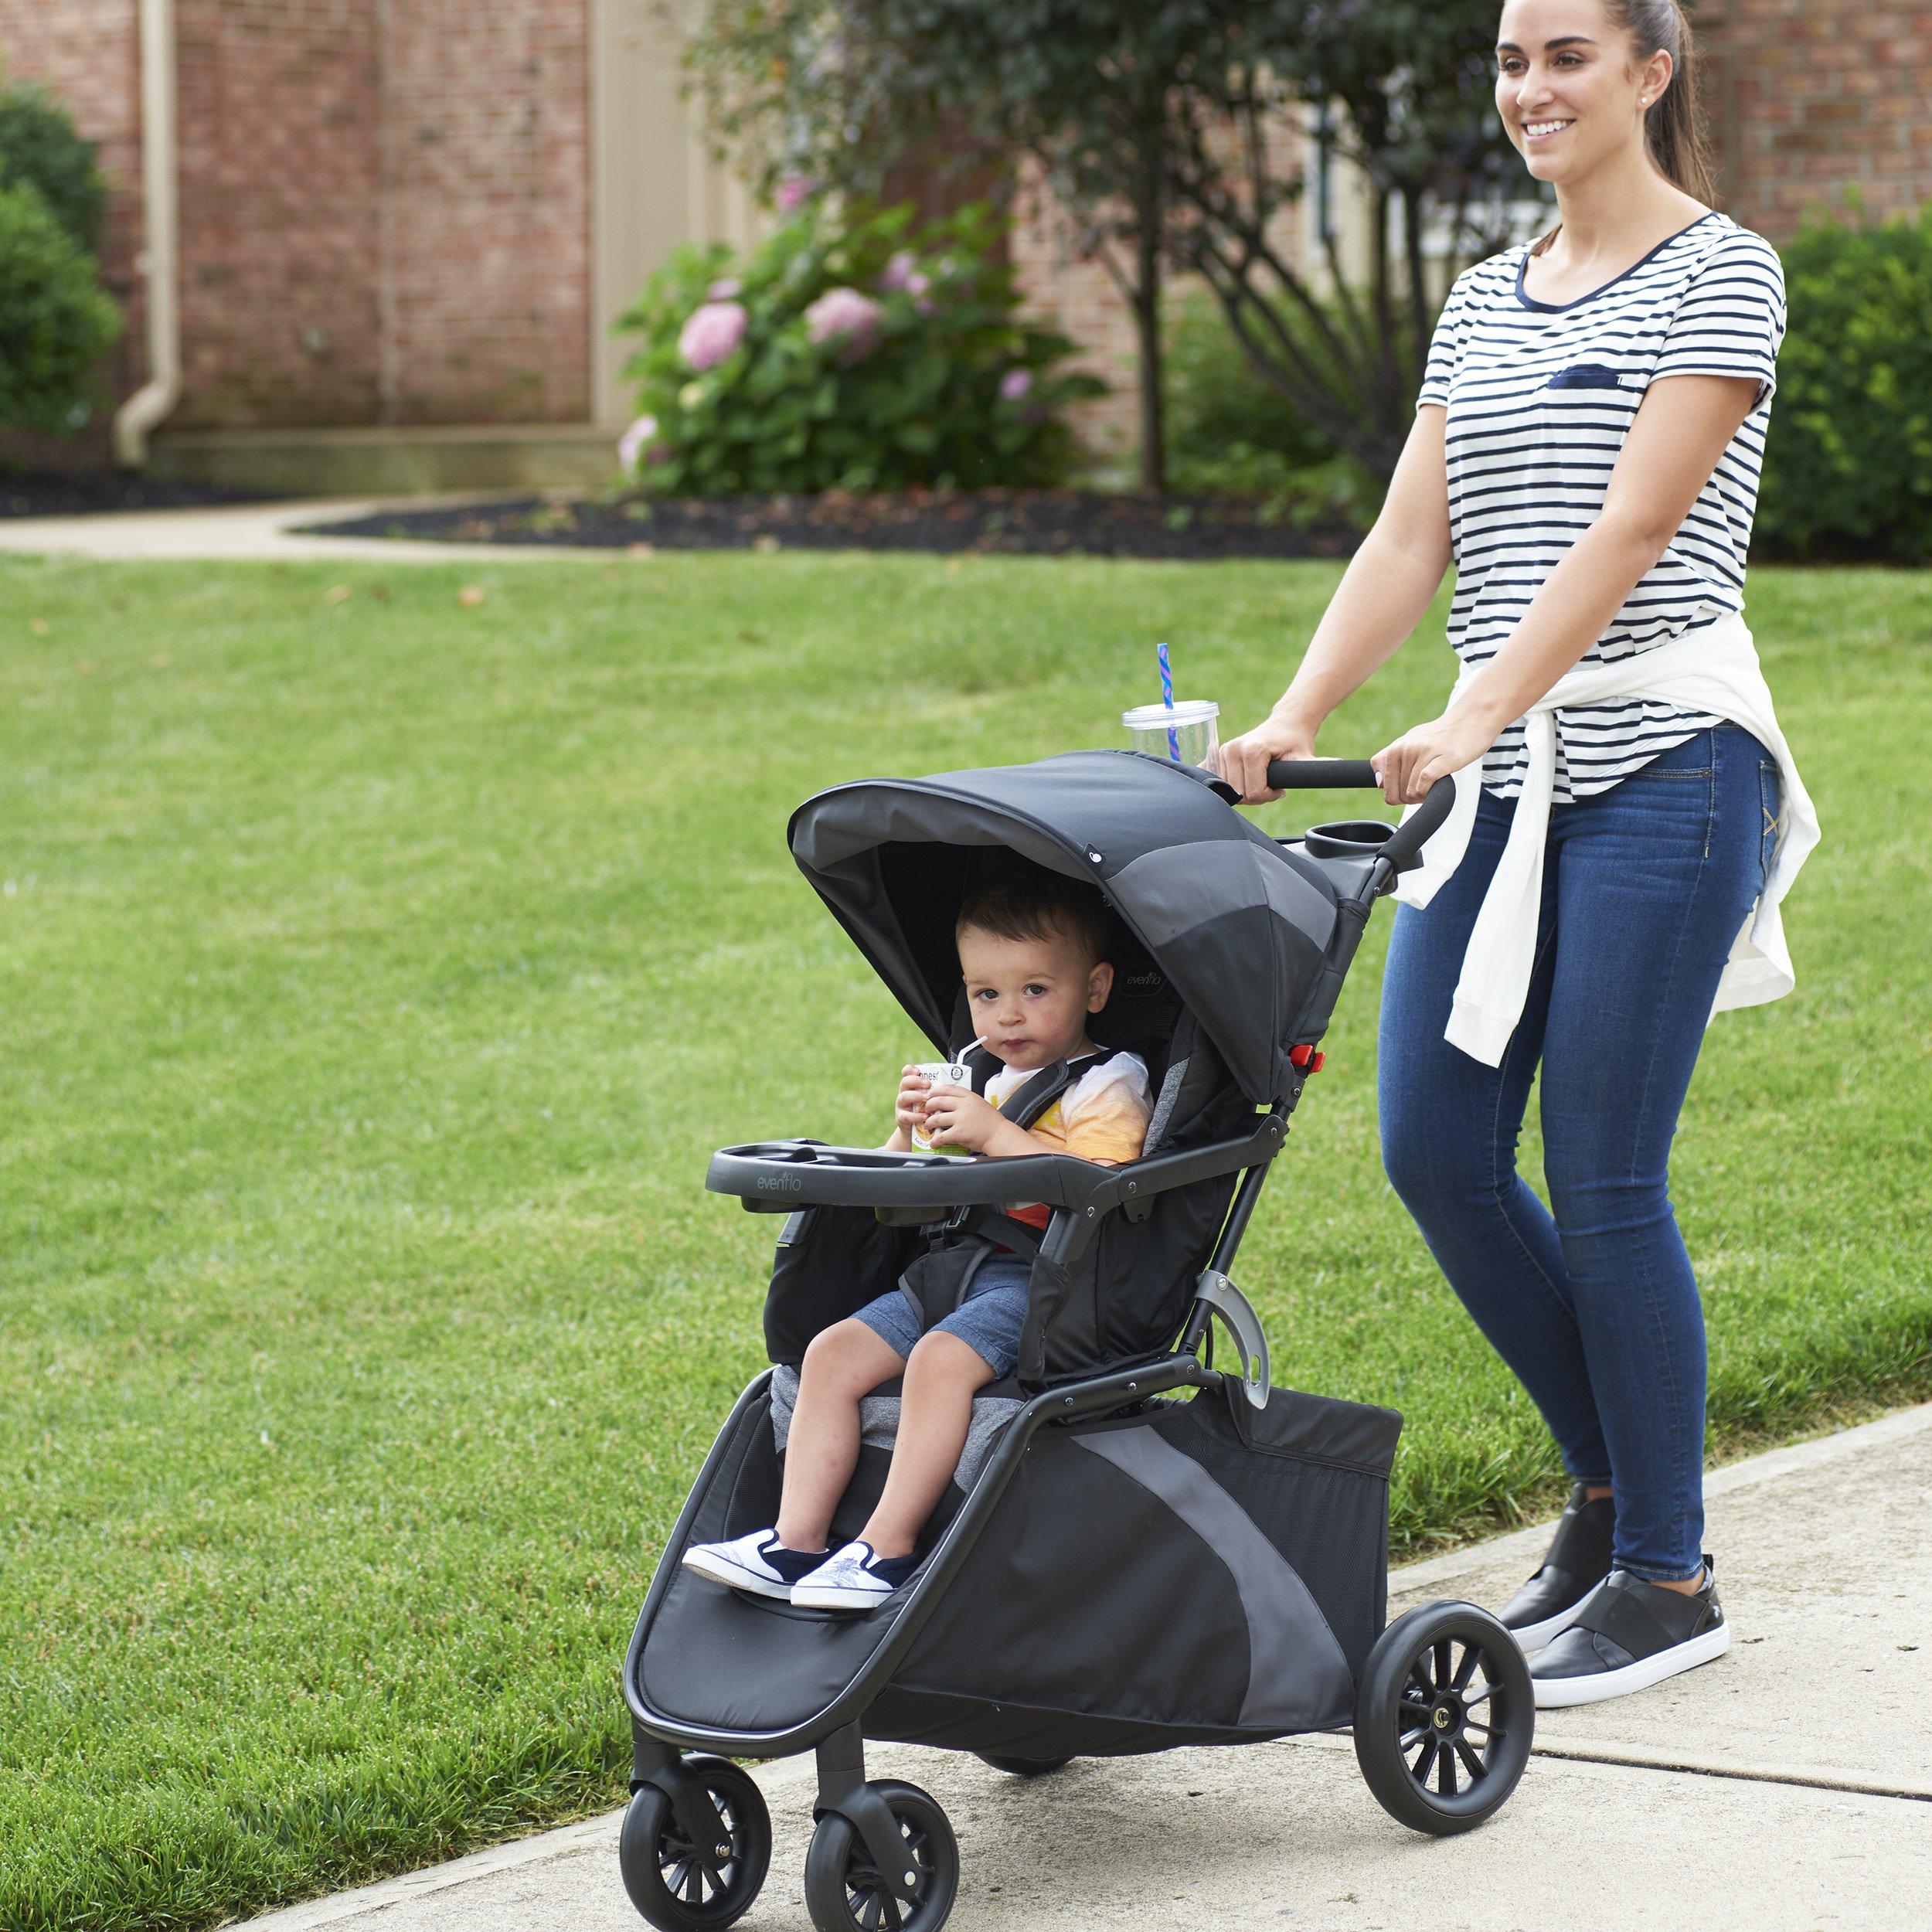 Evenflo Advanced SensorSafe Epic Travel System with LiteMax Infant Car Seat, Jet by Evenflo (Image #13)